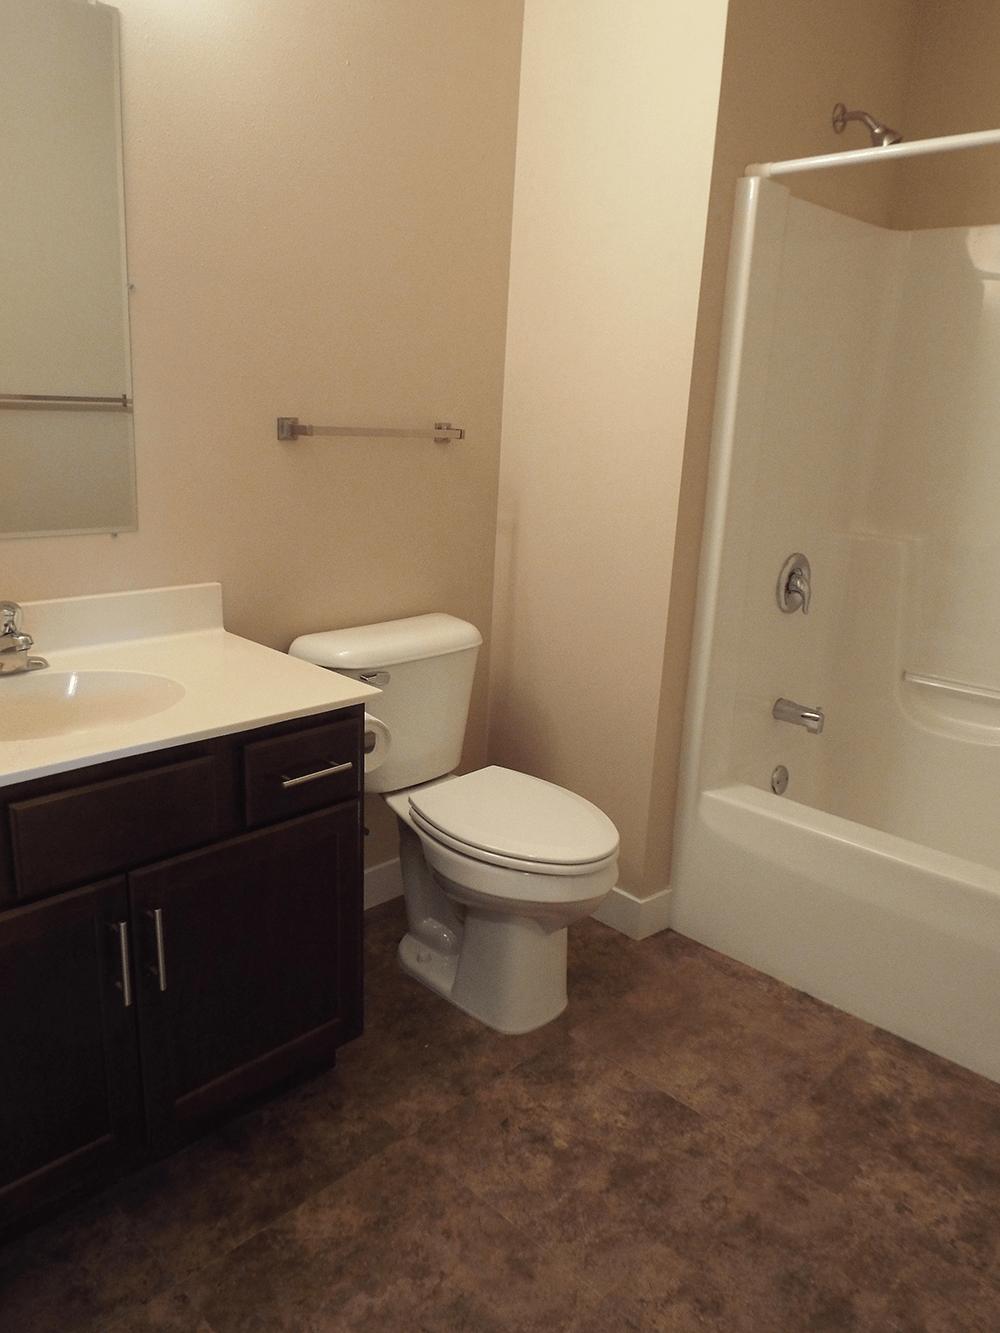 Whitewater Townhomes Washroom